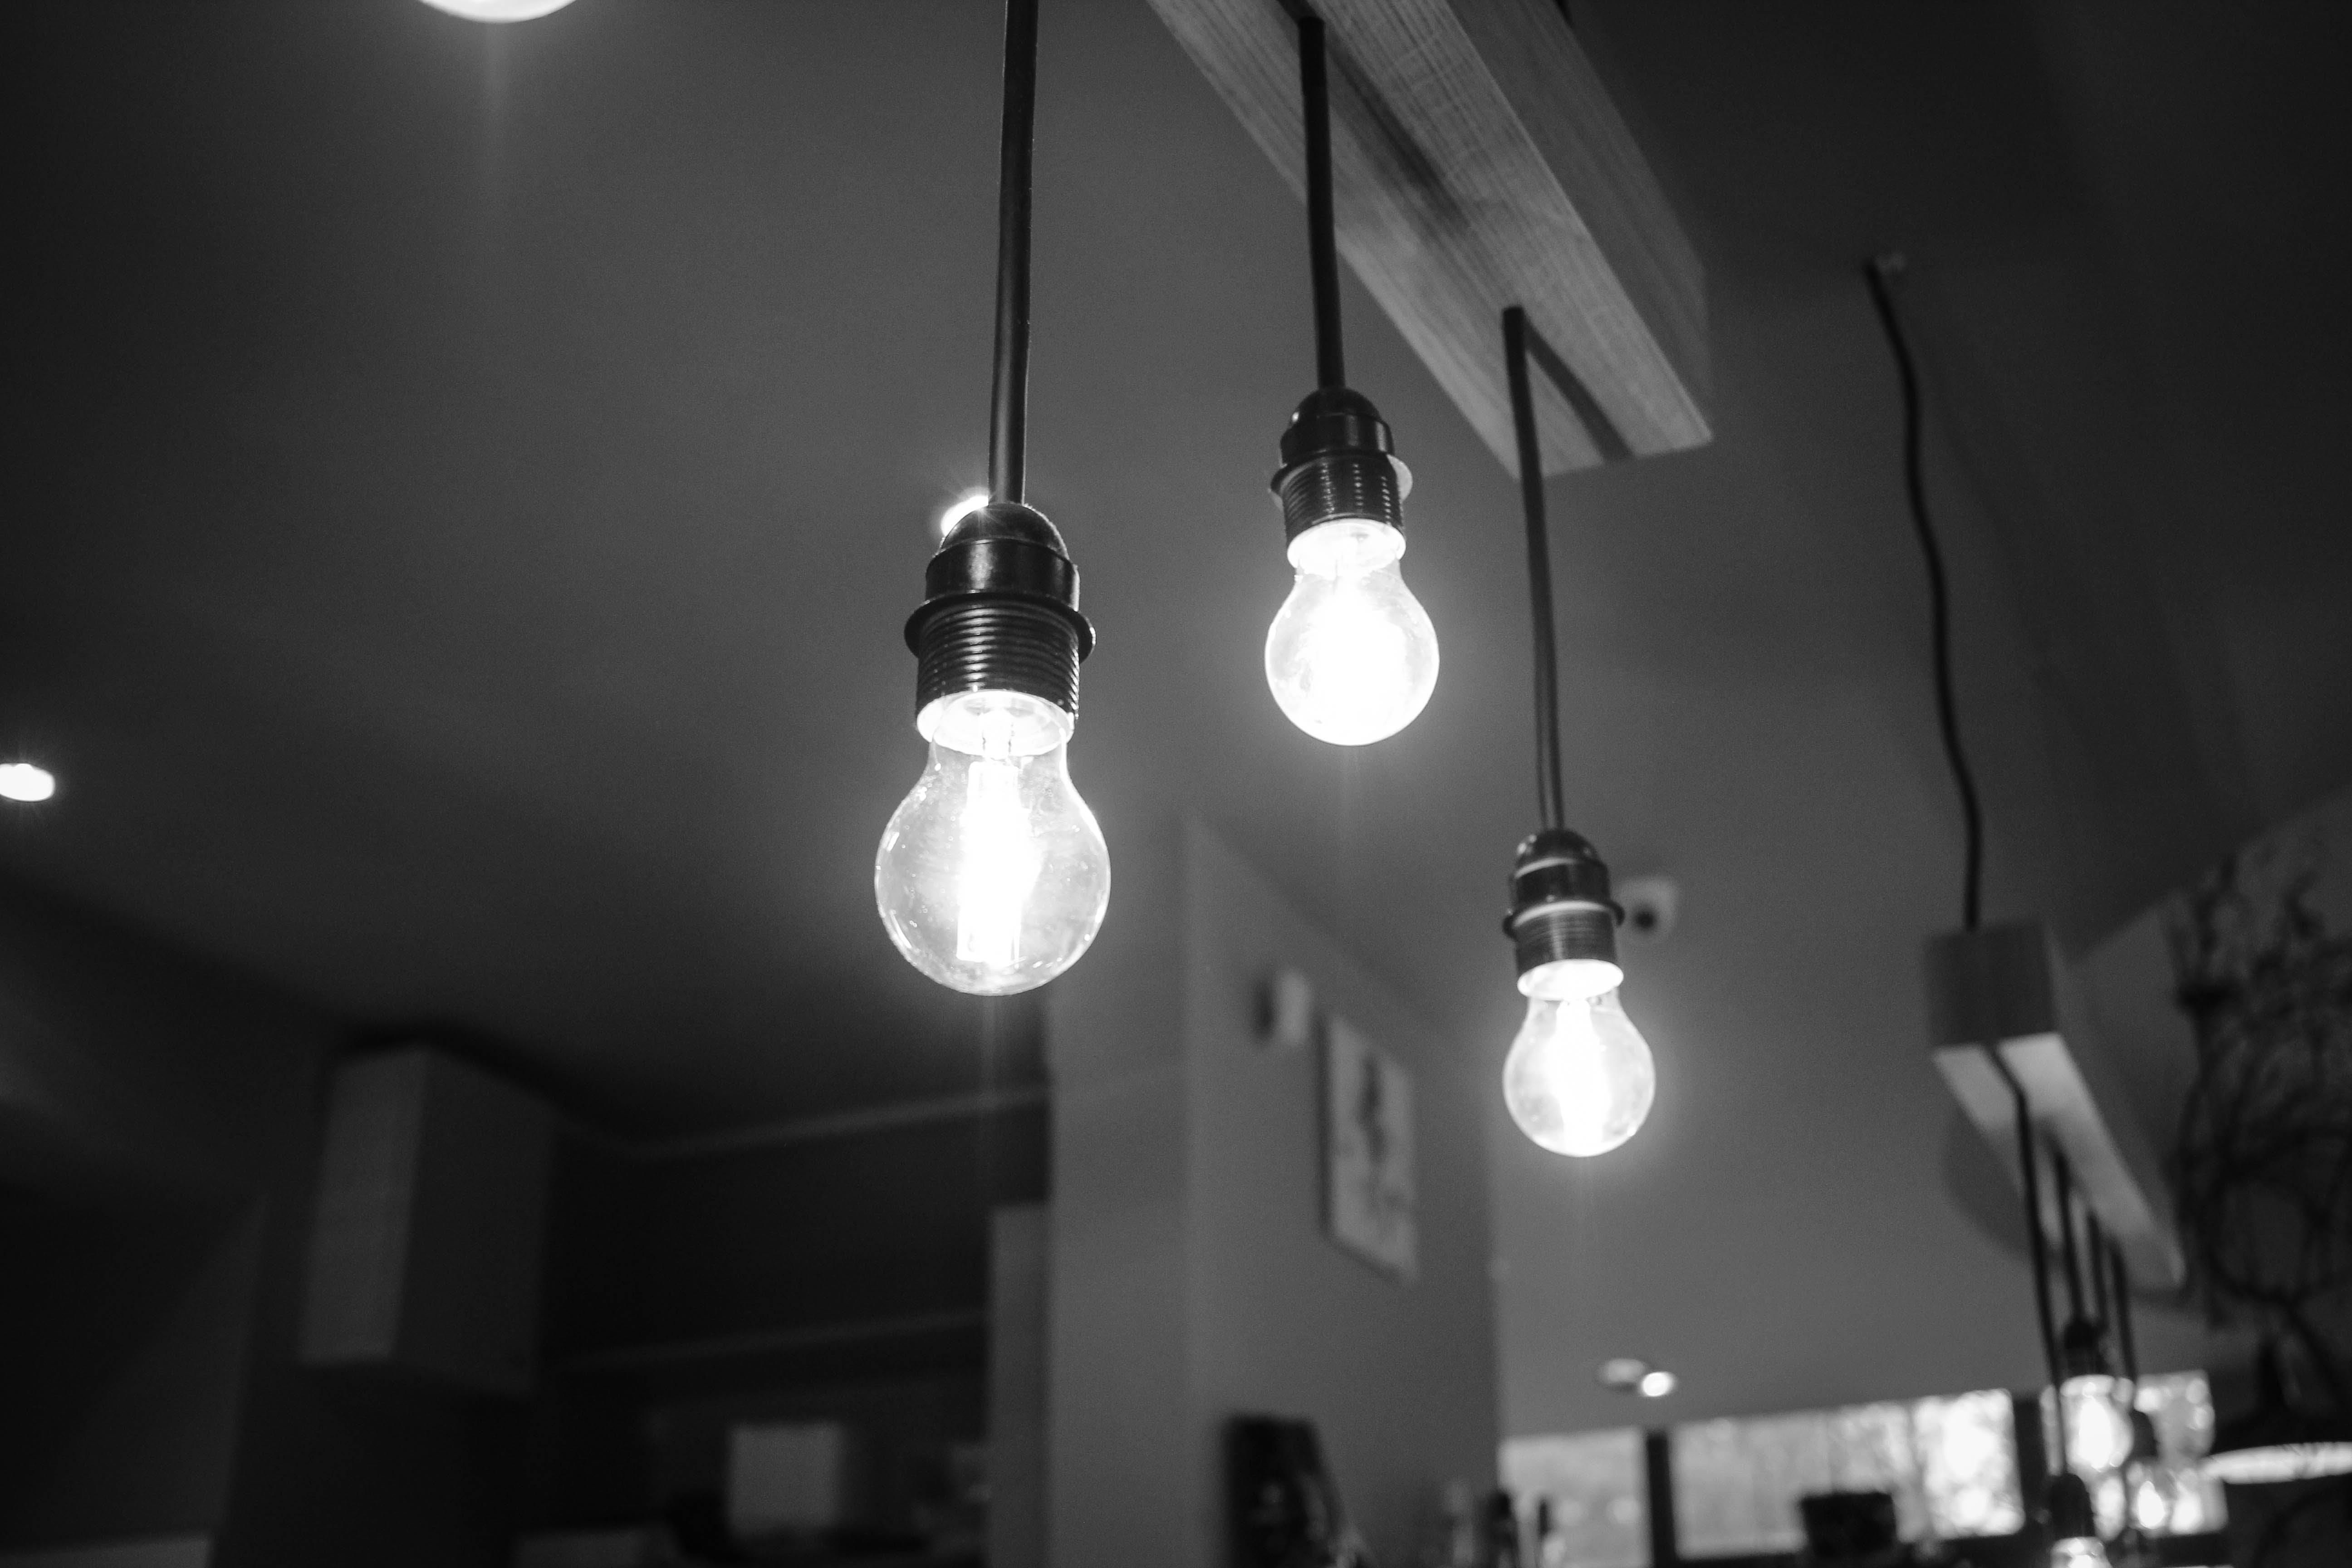 Lighted Pendant Lights